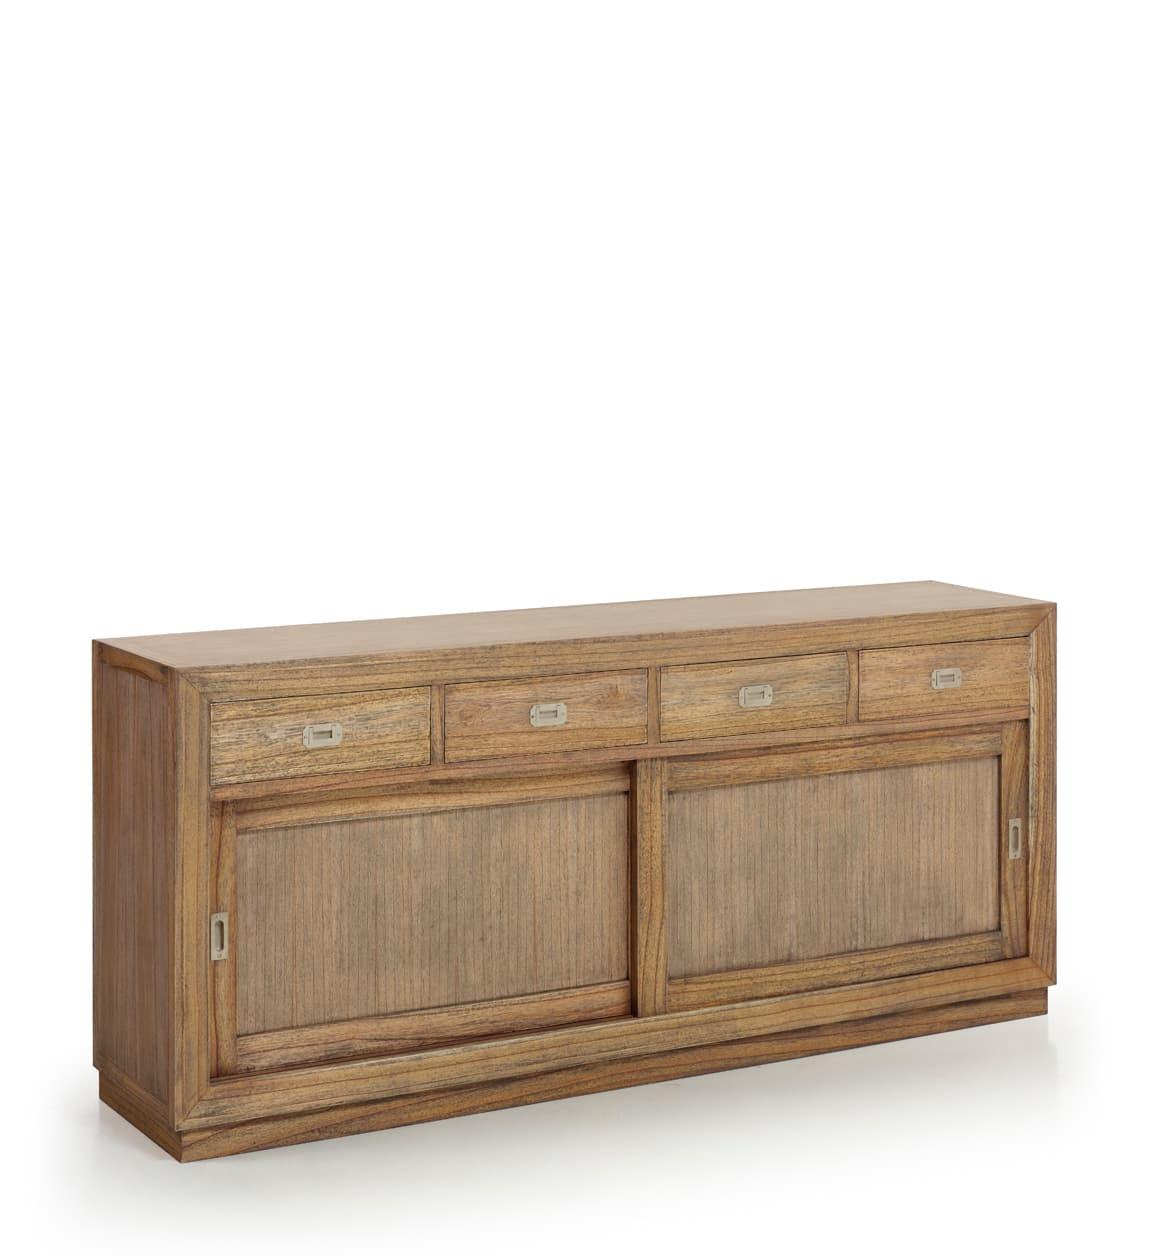 Comoda din lemn cu 4 sertare si 2 usi glisante, Merapi Natural, l200xA50xH90 cm somproduct.ro